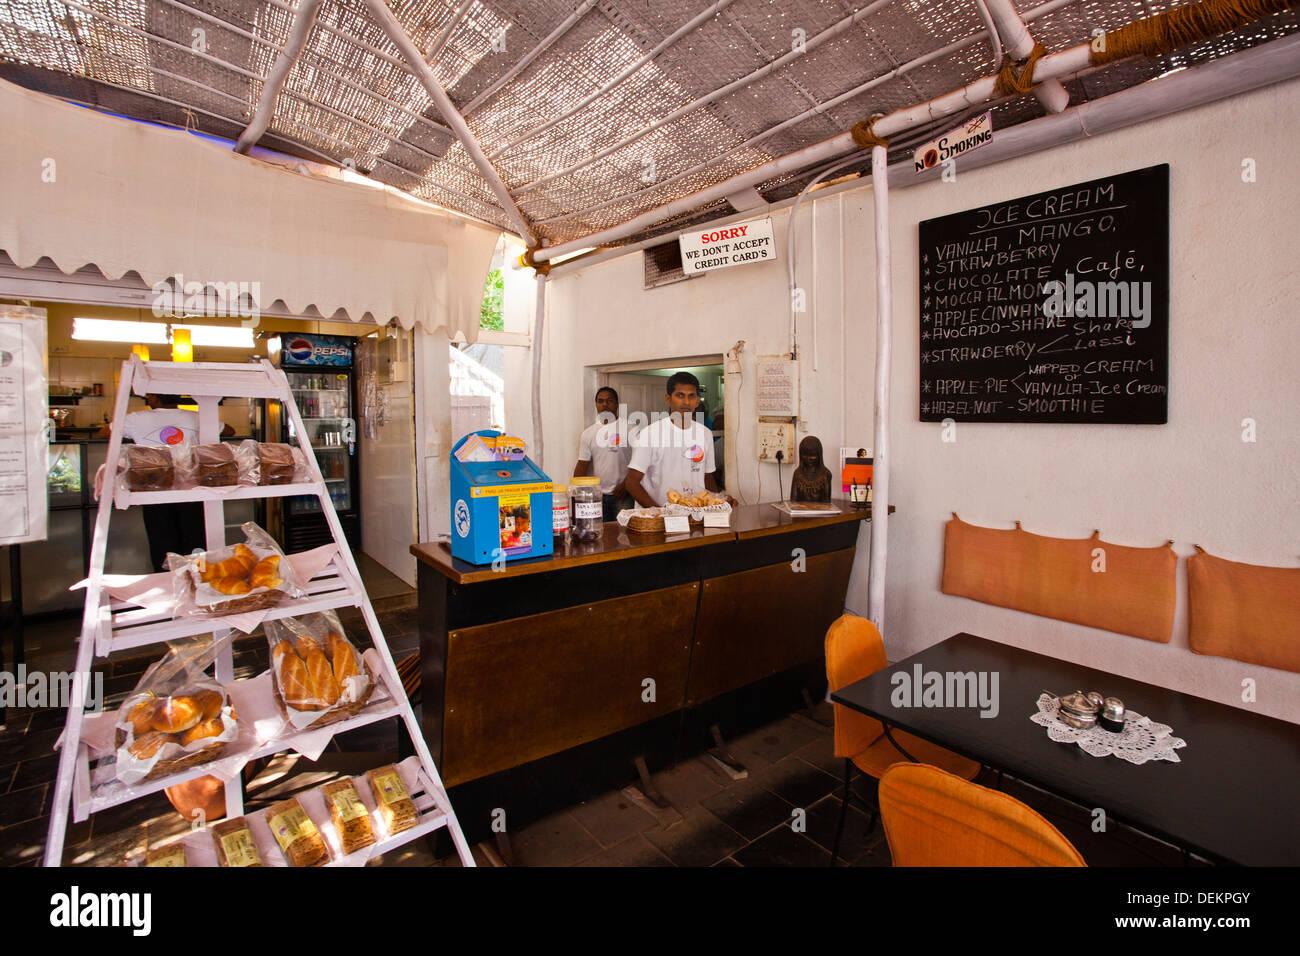 Counter clerk at a counter, Lila Cafe, Calangute, North Goa, Goa, India - Stock Image